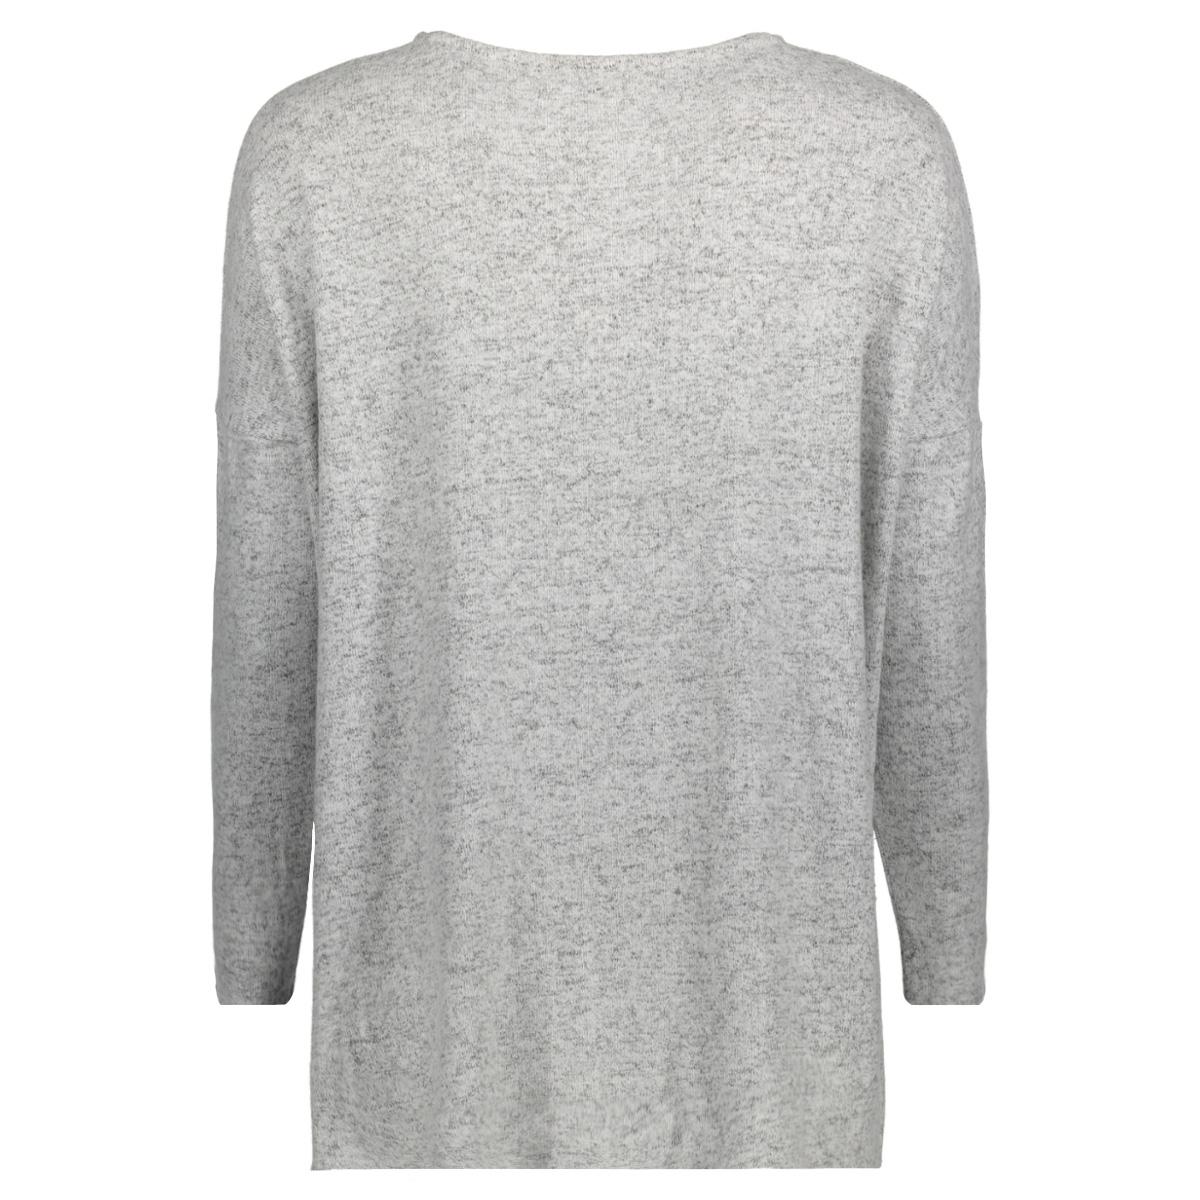 onlkleo l/s v-neck pullover knt noo 15148668 only trui light grey melange